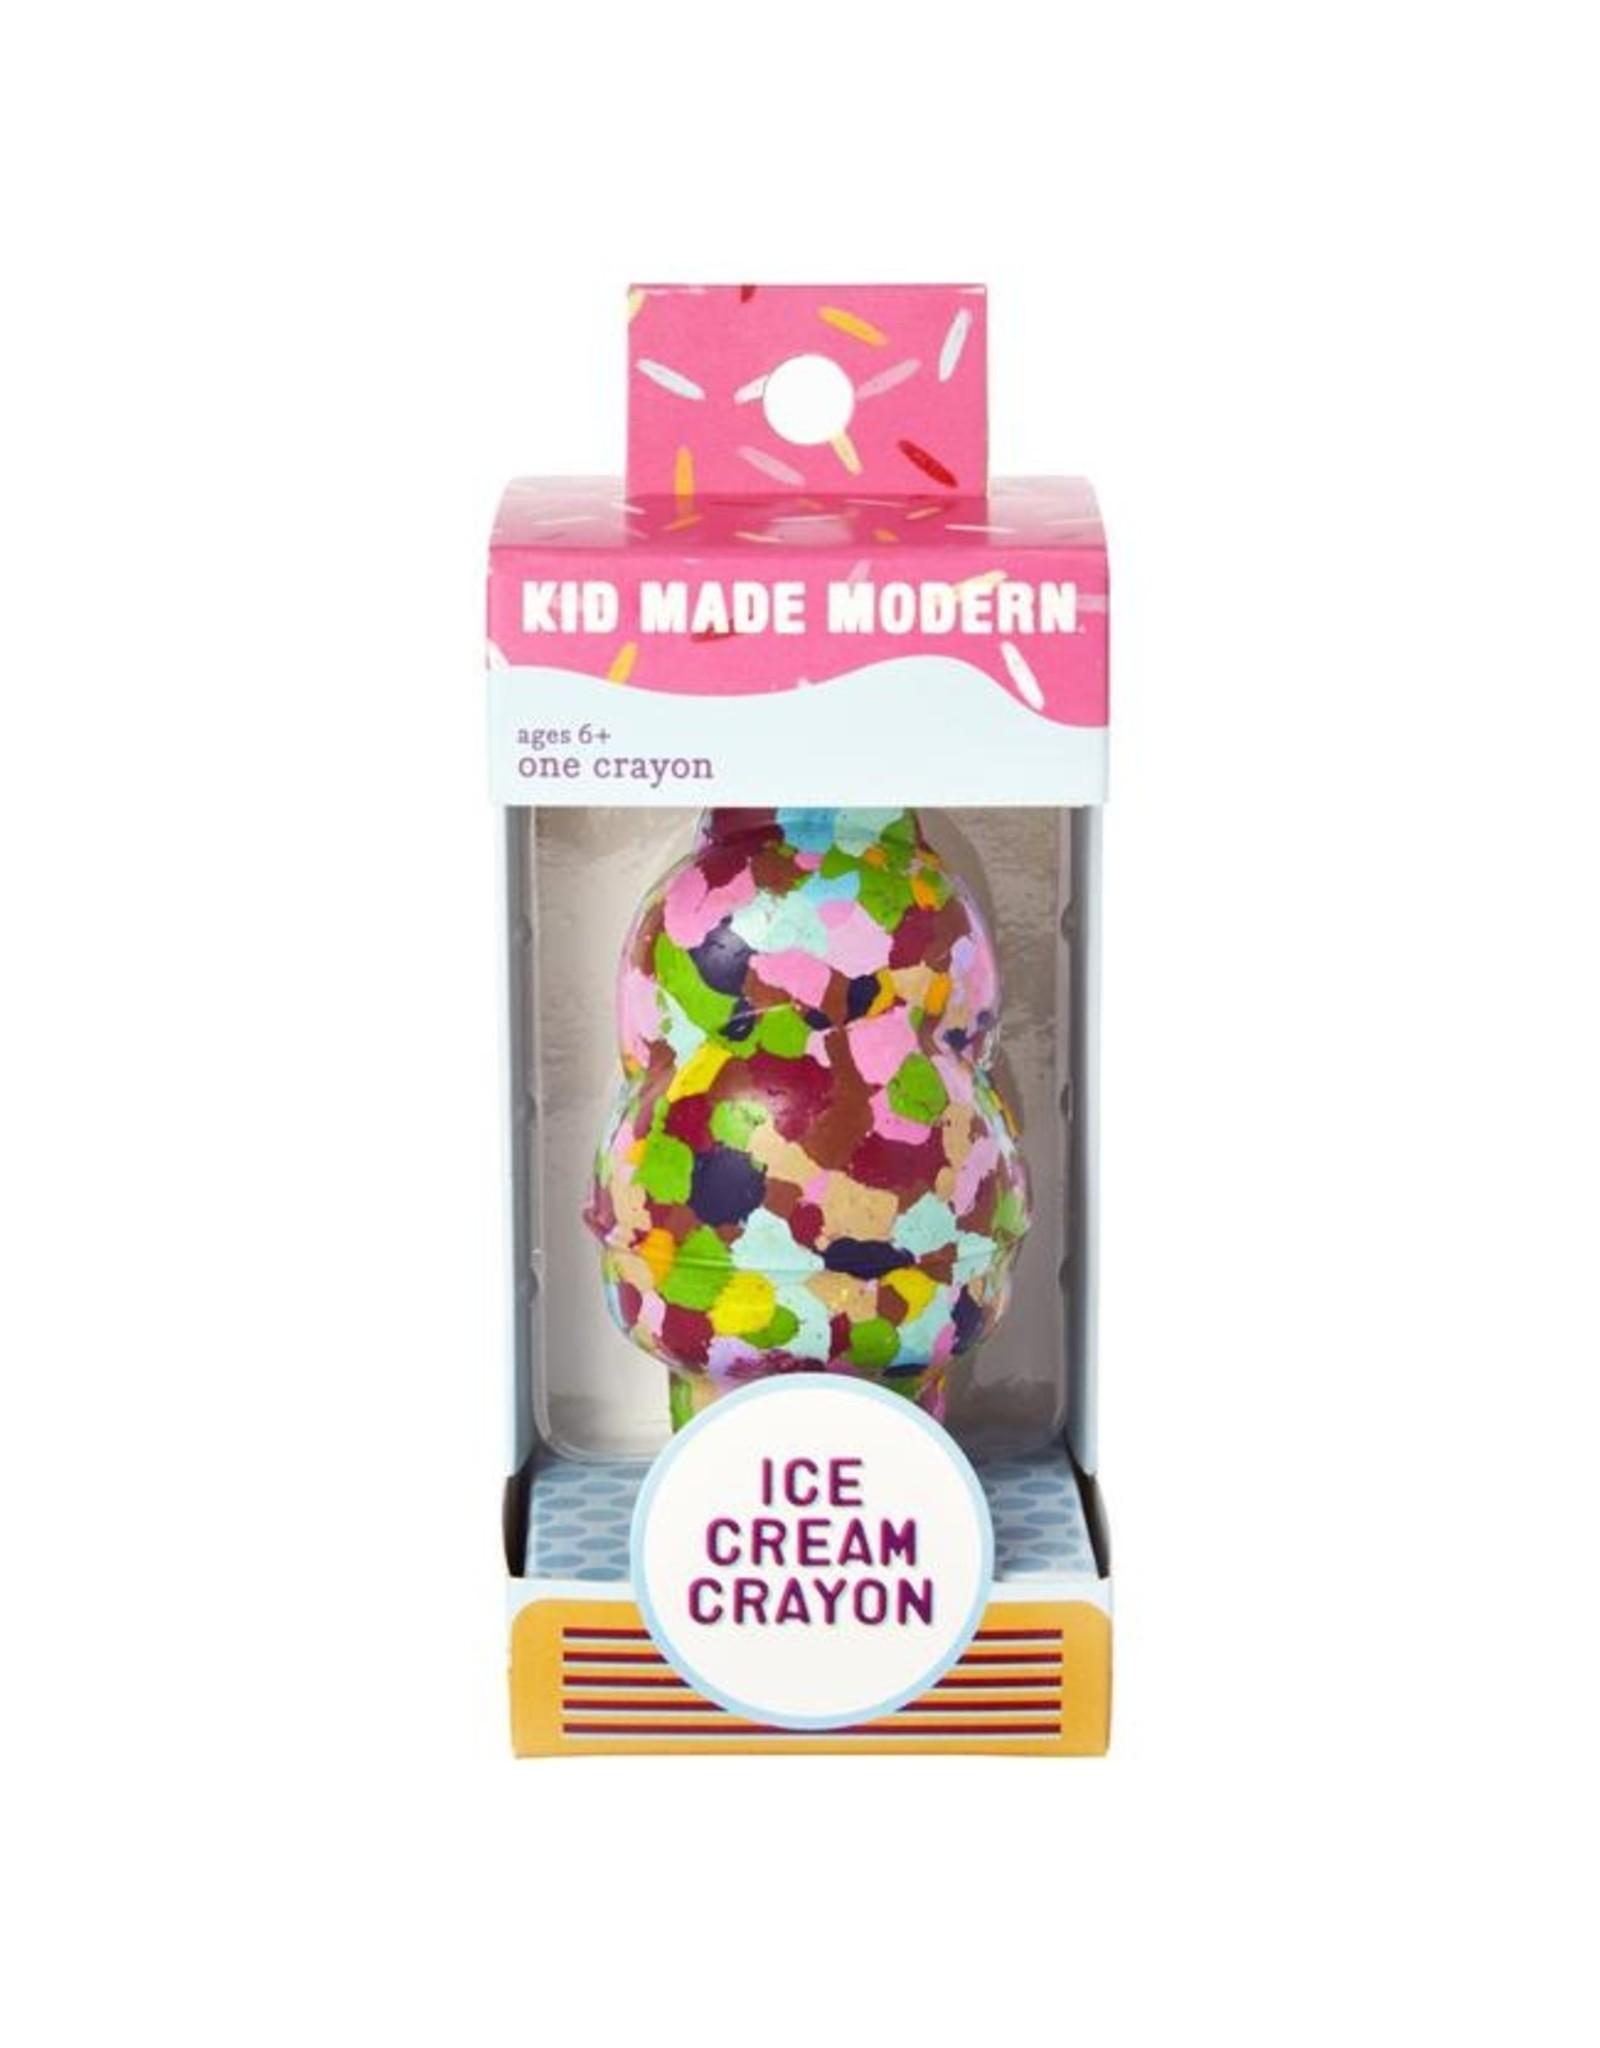 Kid Made Modern Ice Cream Crayon